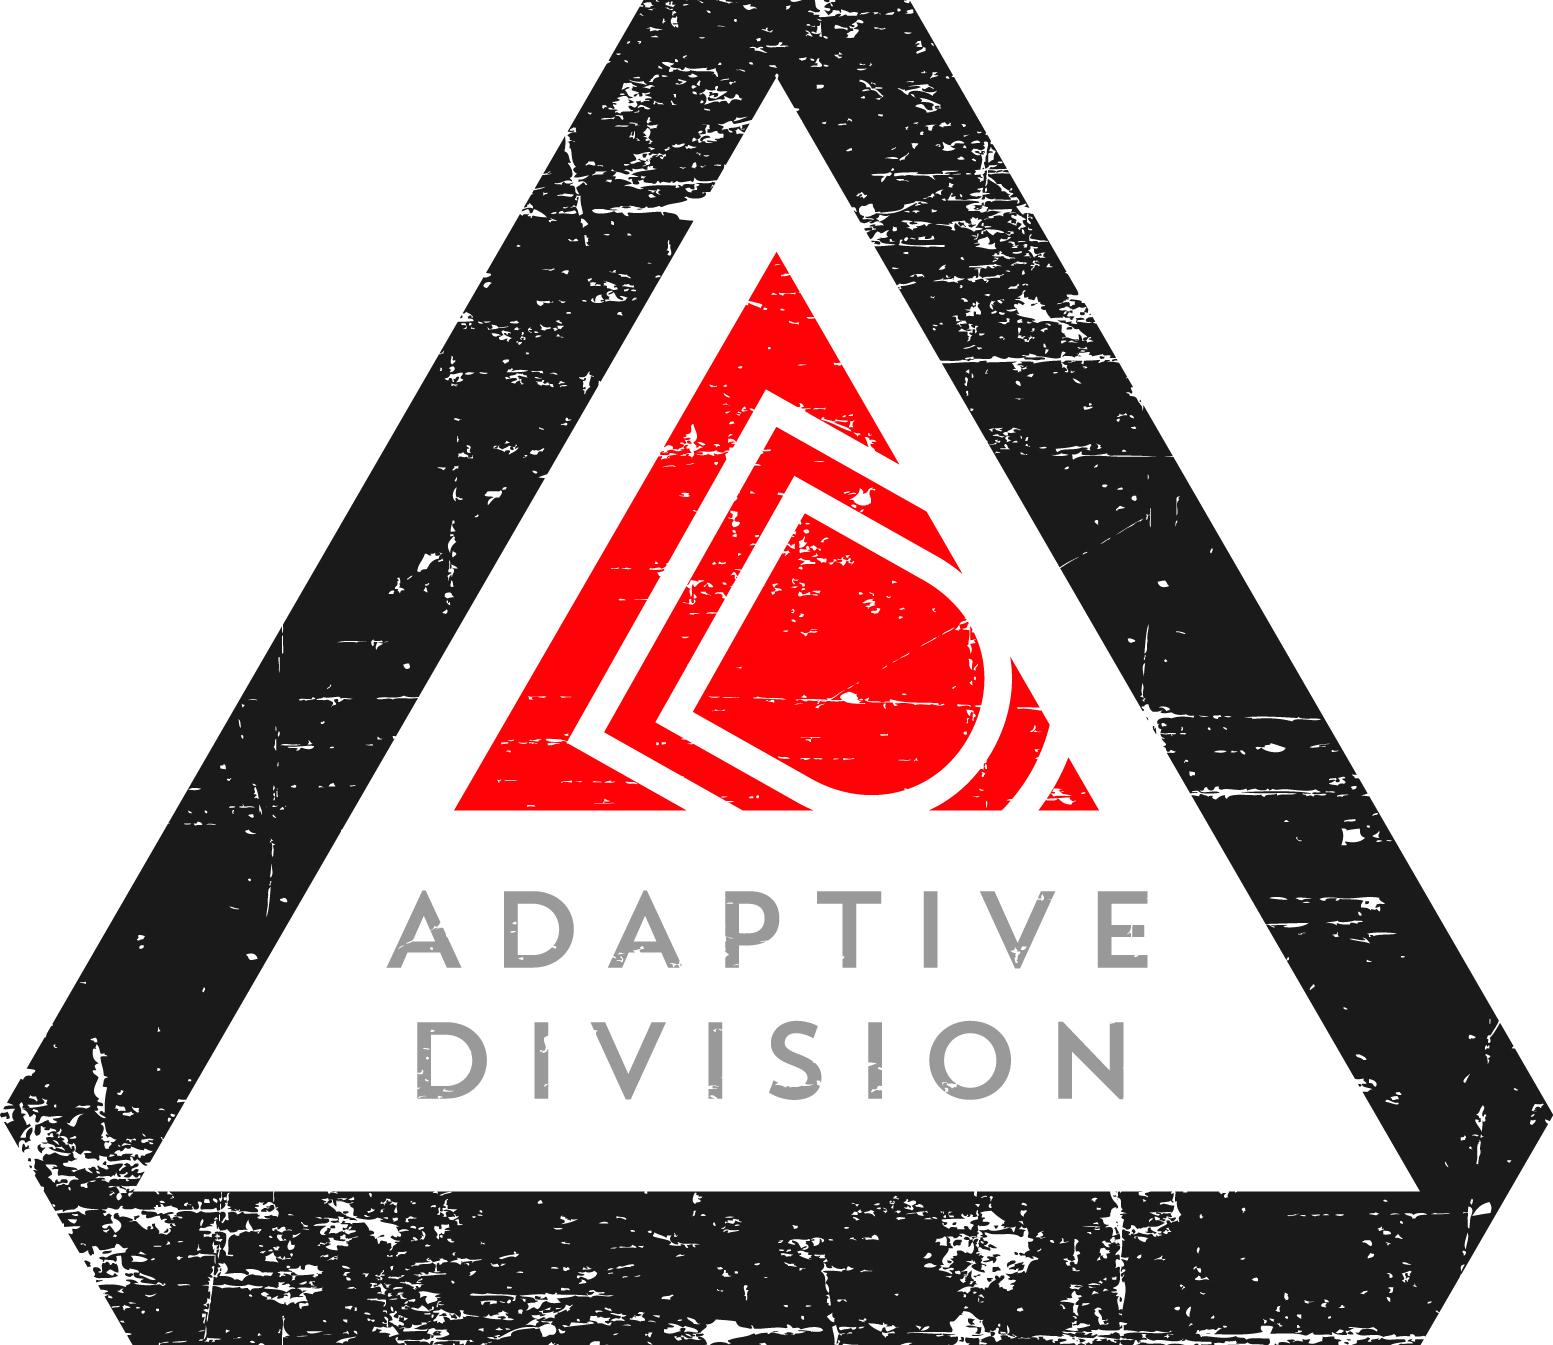 AdaptiveDivisionLogo